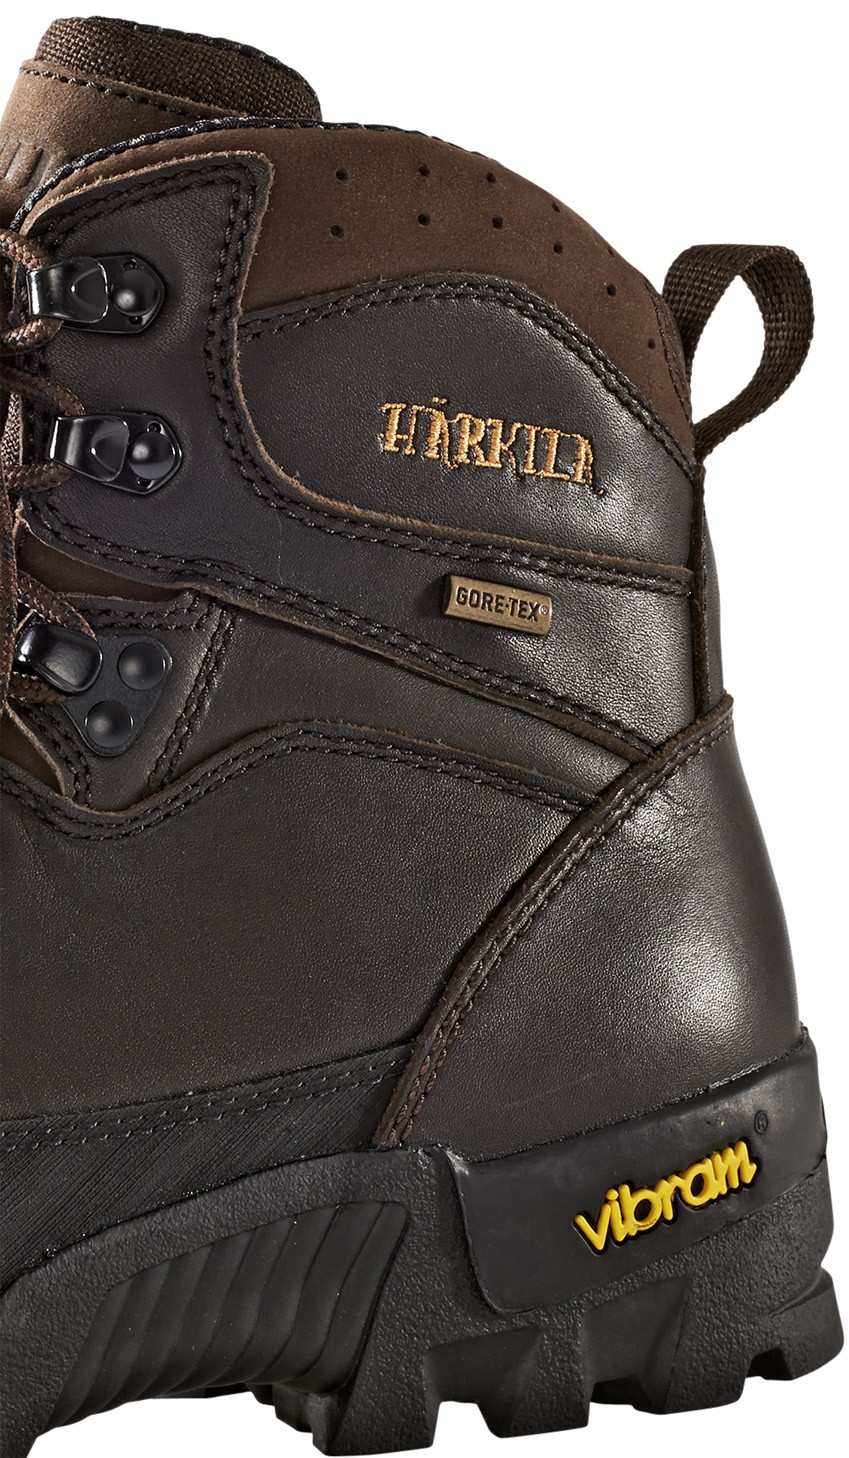 Chaussures en cuir pleine fleur Moutain Trek GTX6 Härkila